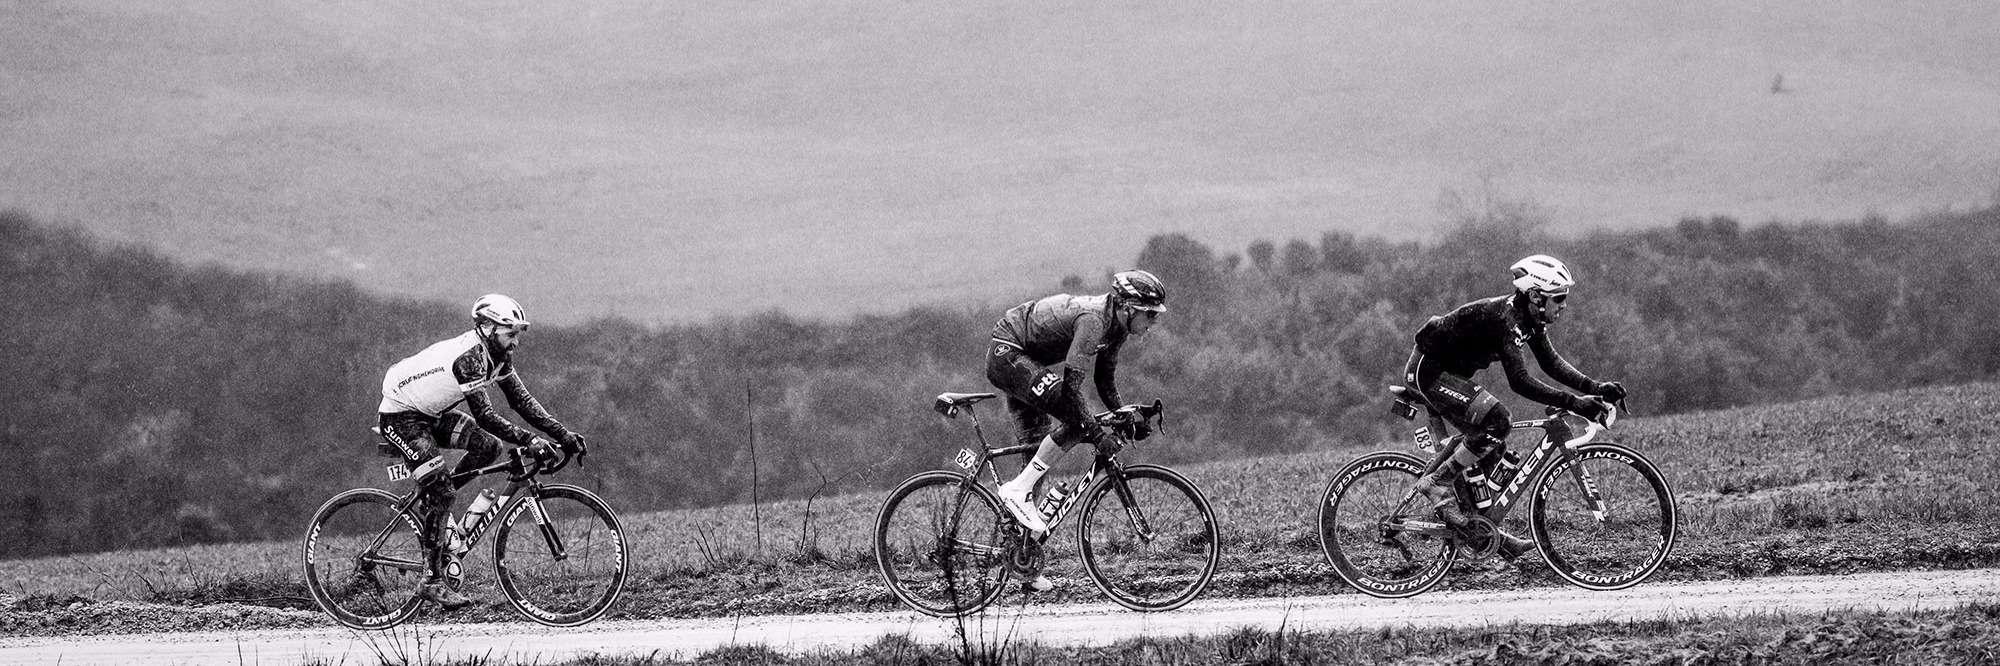 Three road cyclists